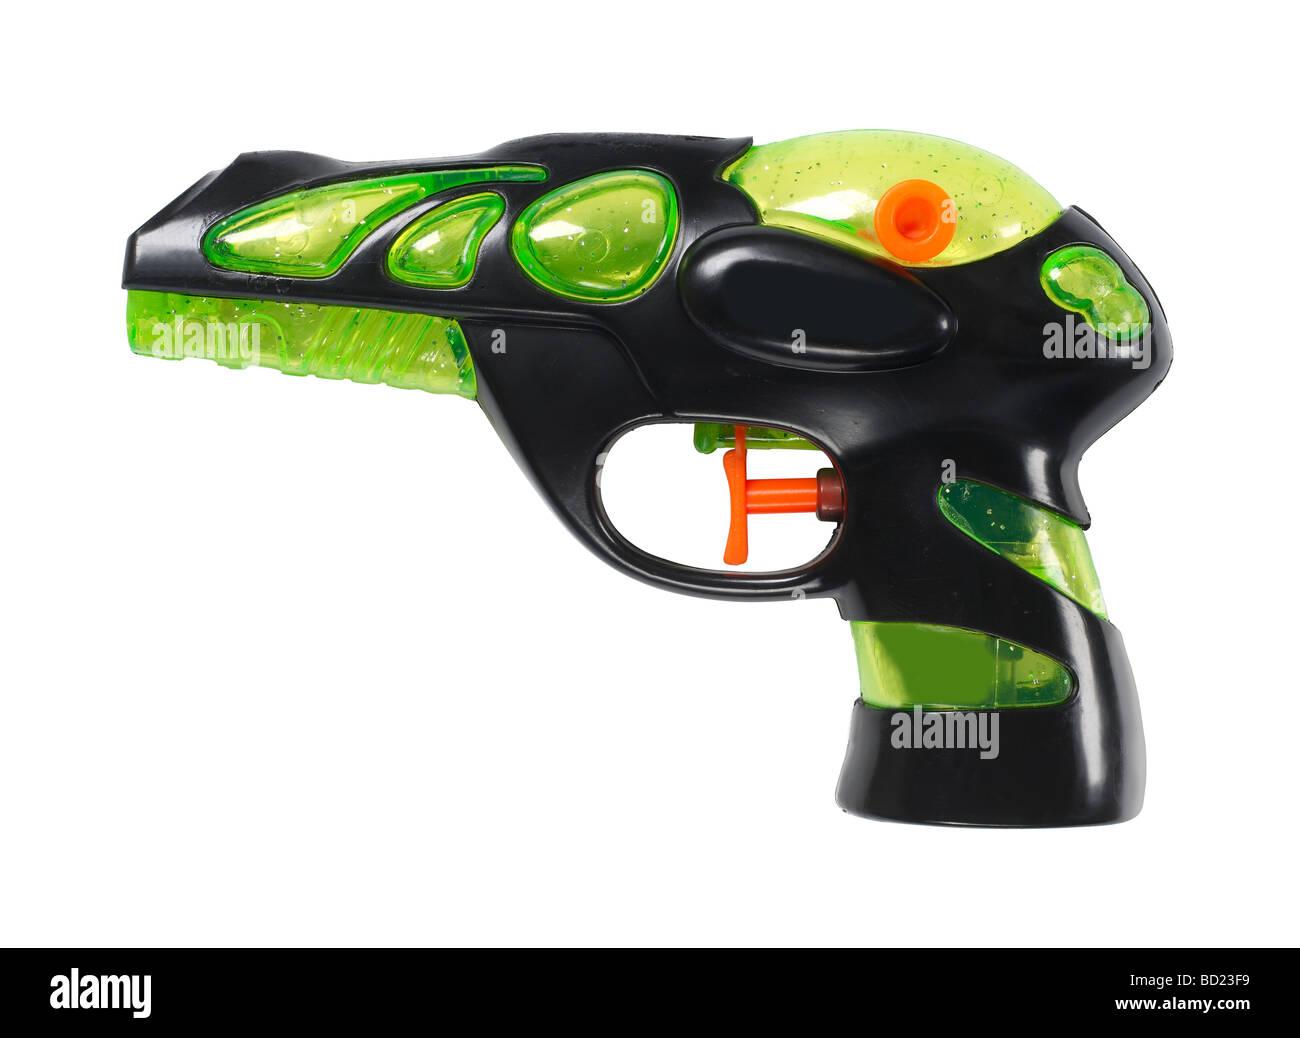 Green and black water gun - Stock Image